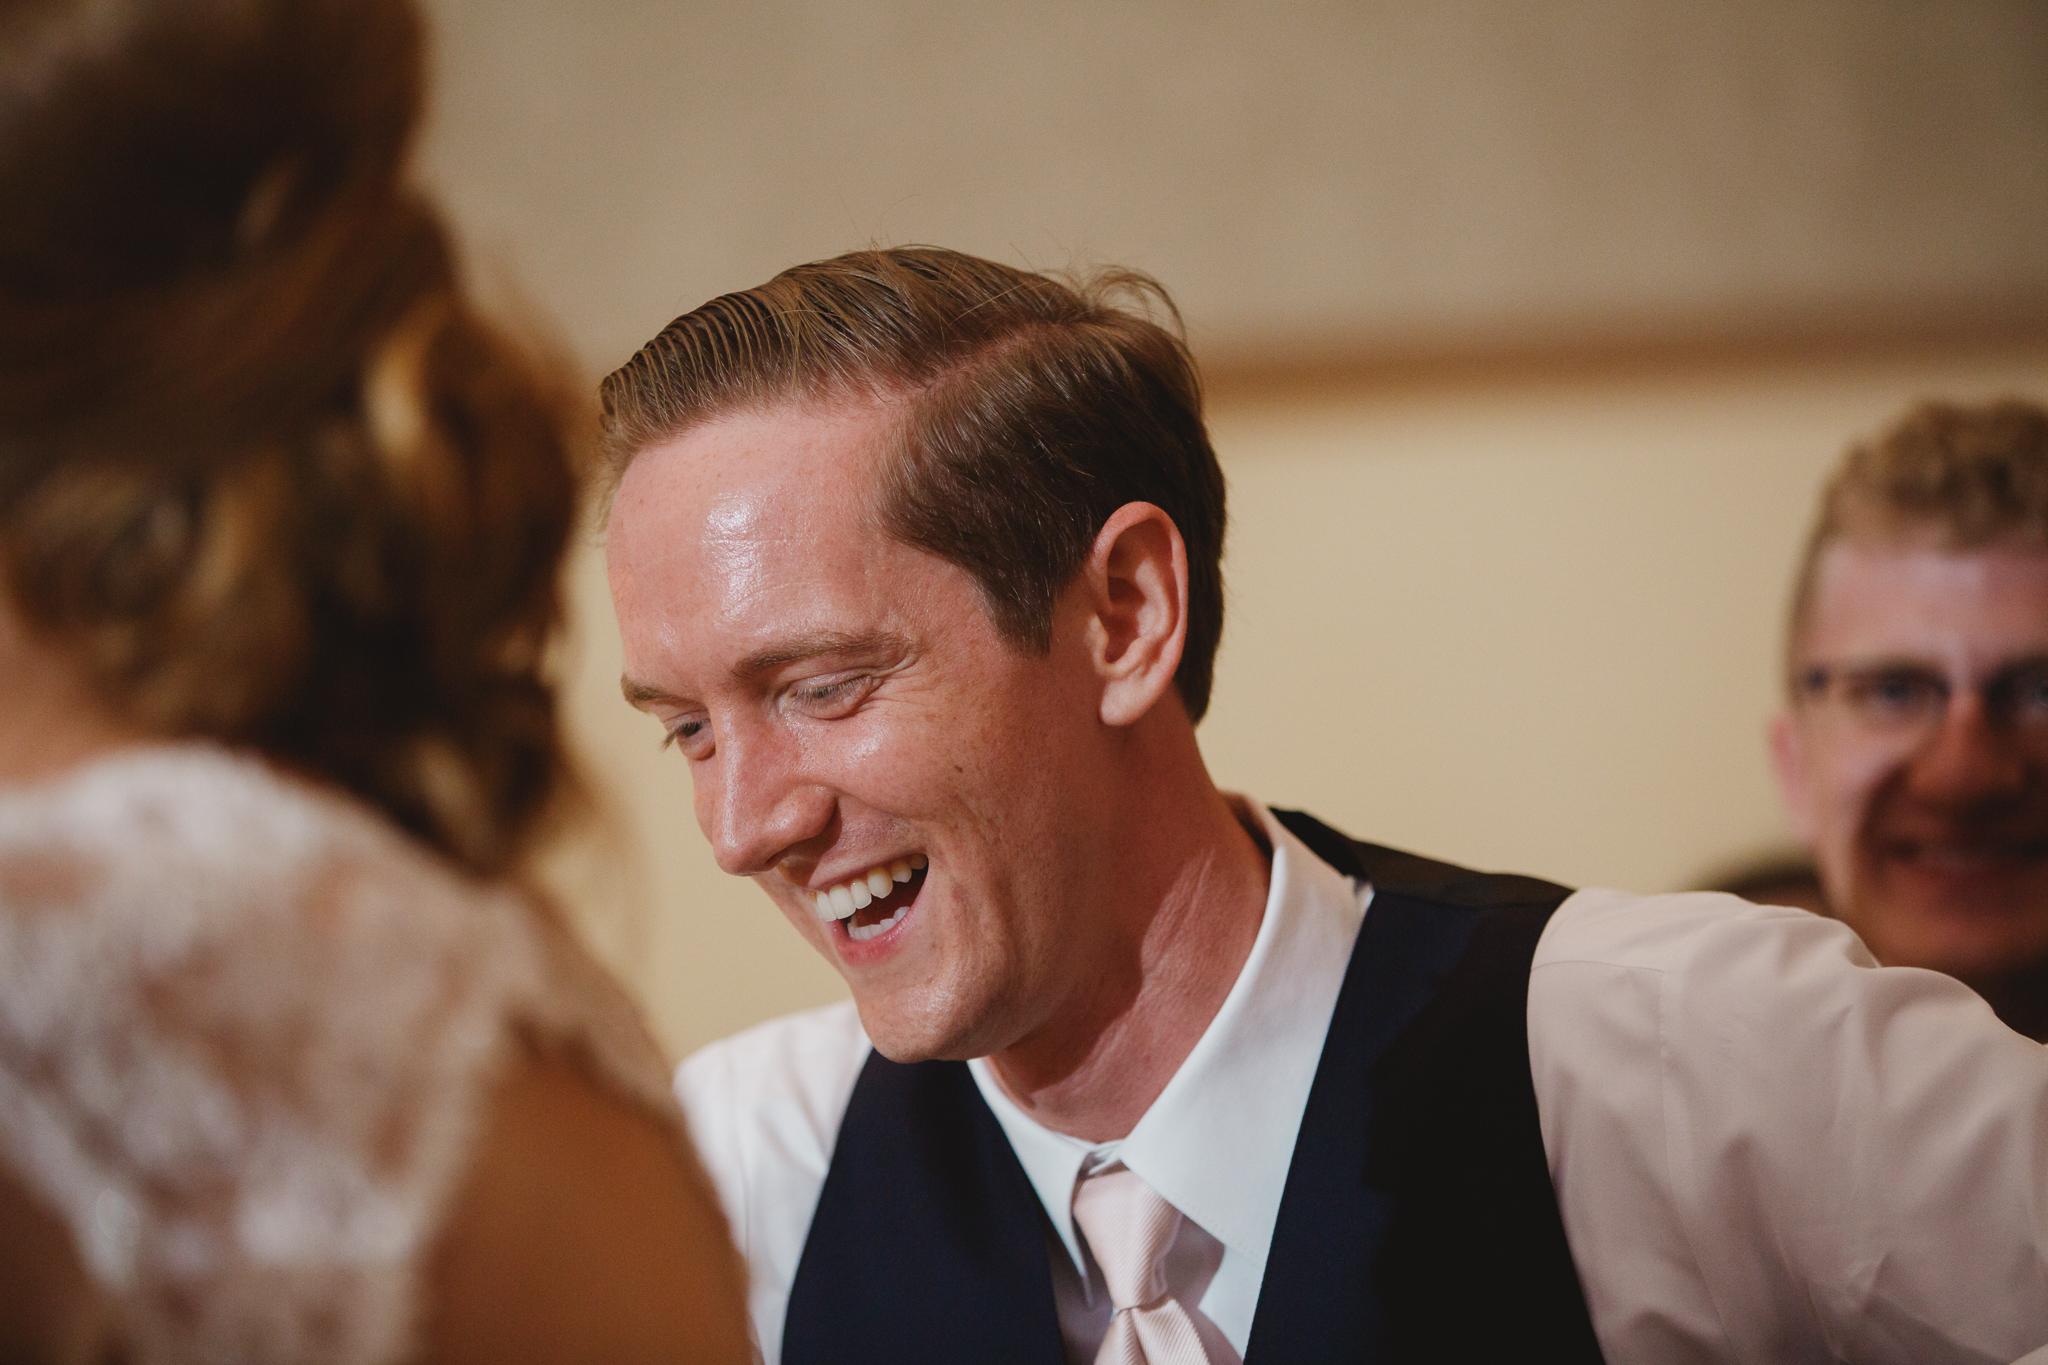 Michael and Kelly - the ashton depot - wedding DFW - wedding photographer- elizalde photography (109 of 150).jpg